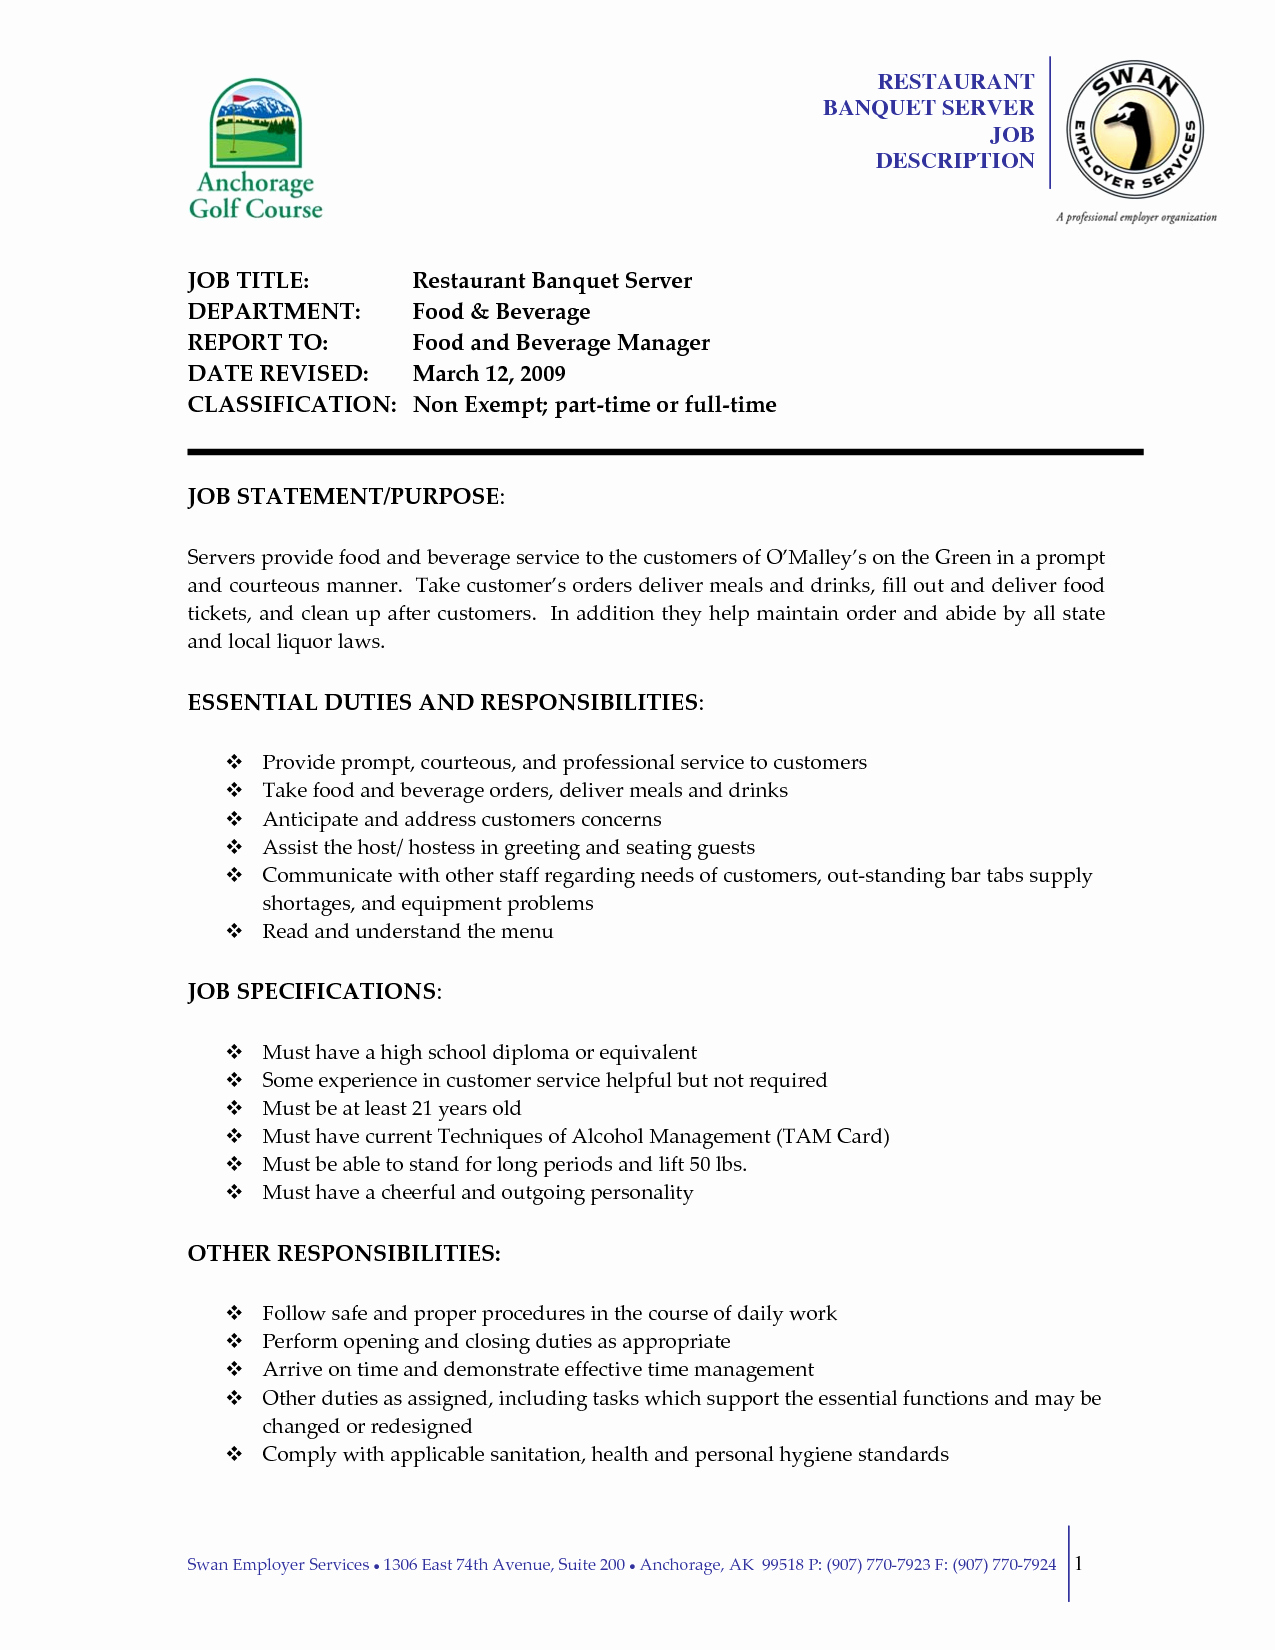 Server Job Duties for Resume Resume Ideas